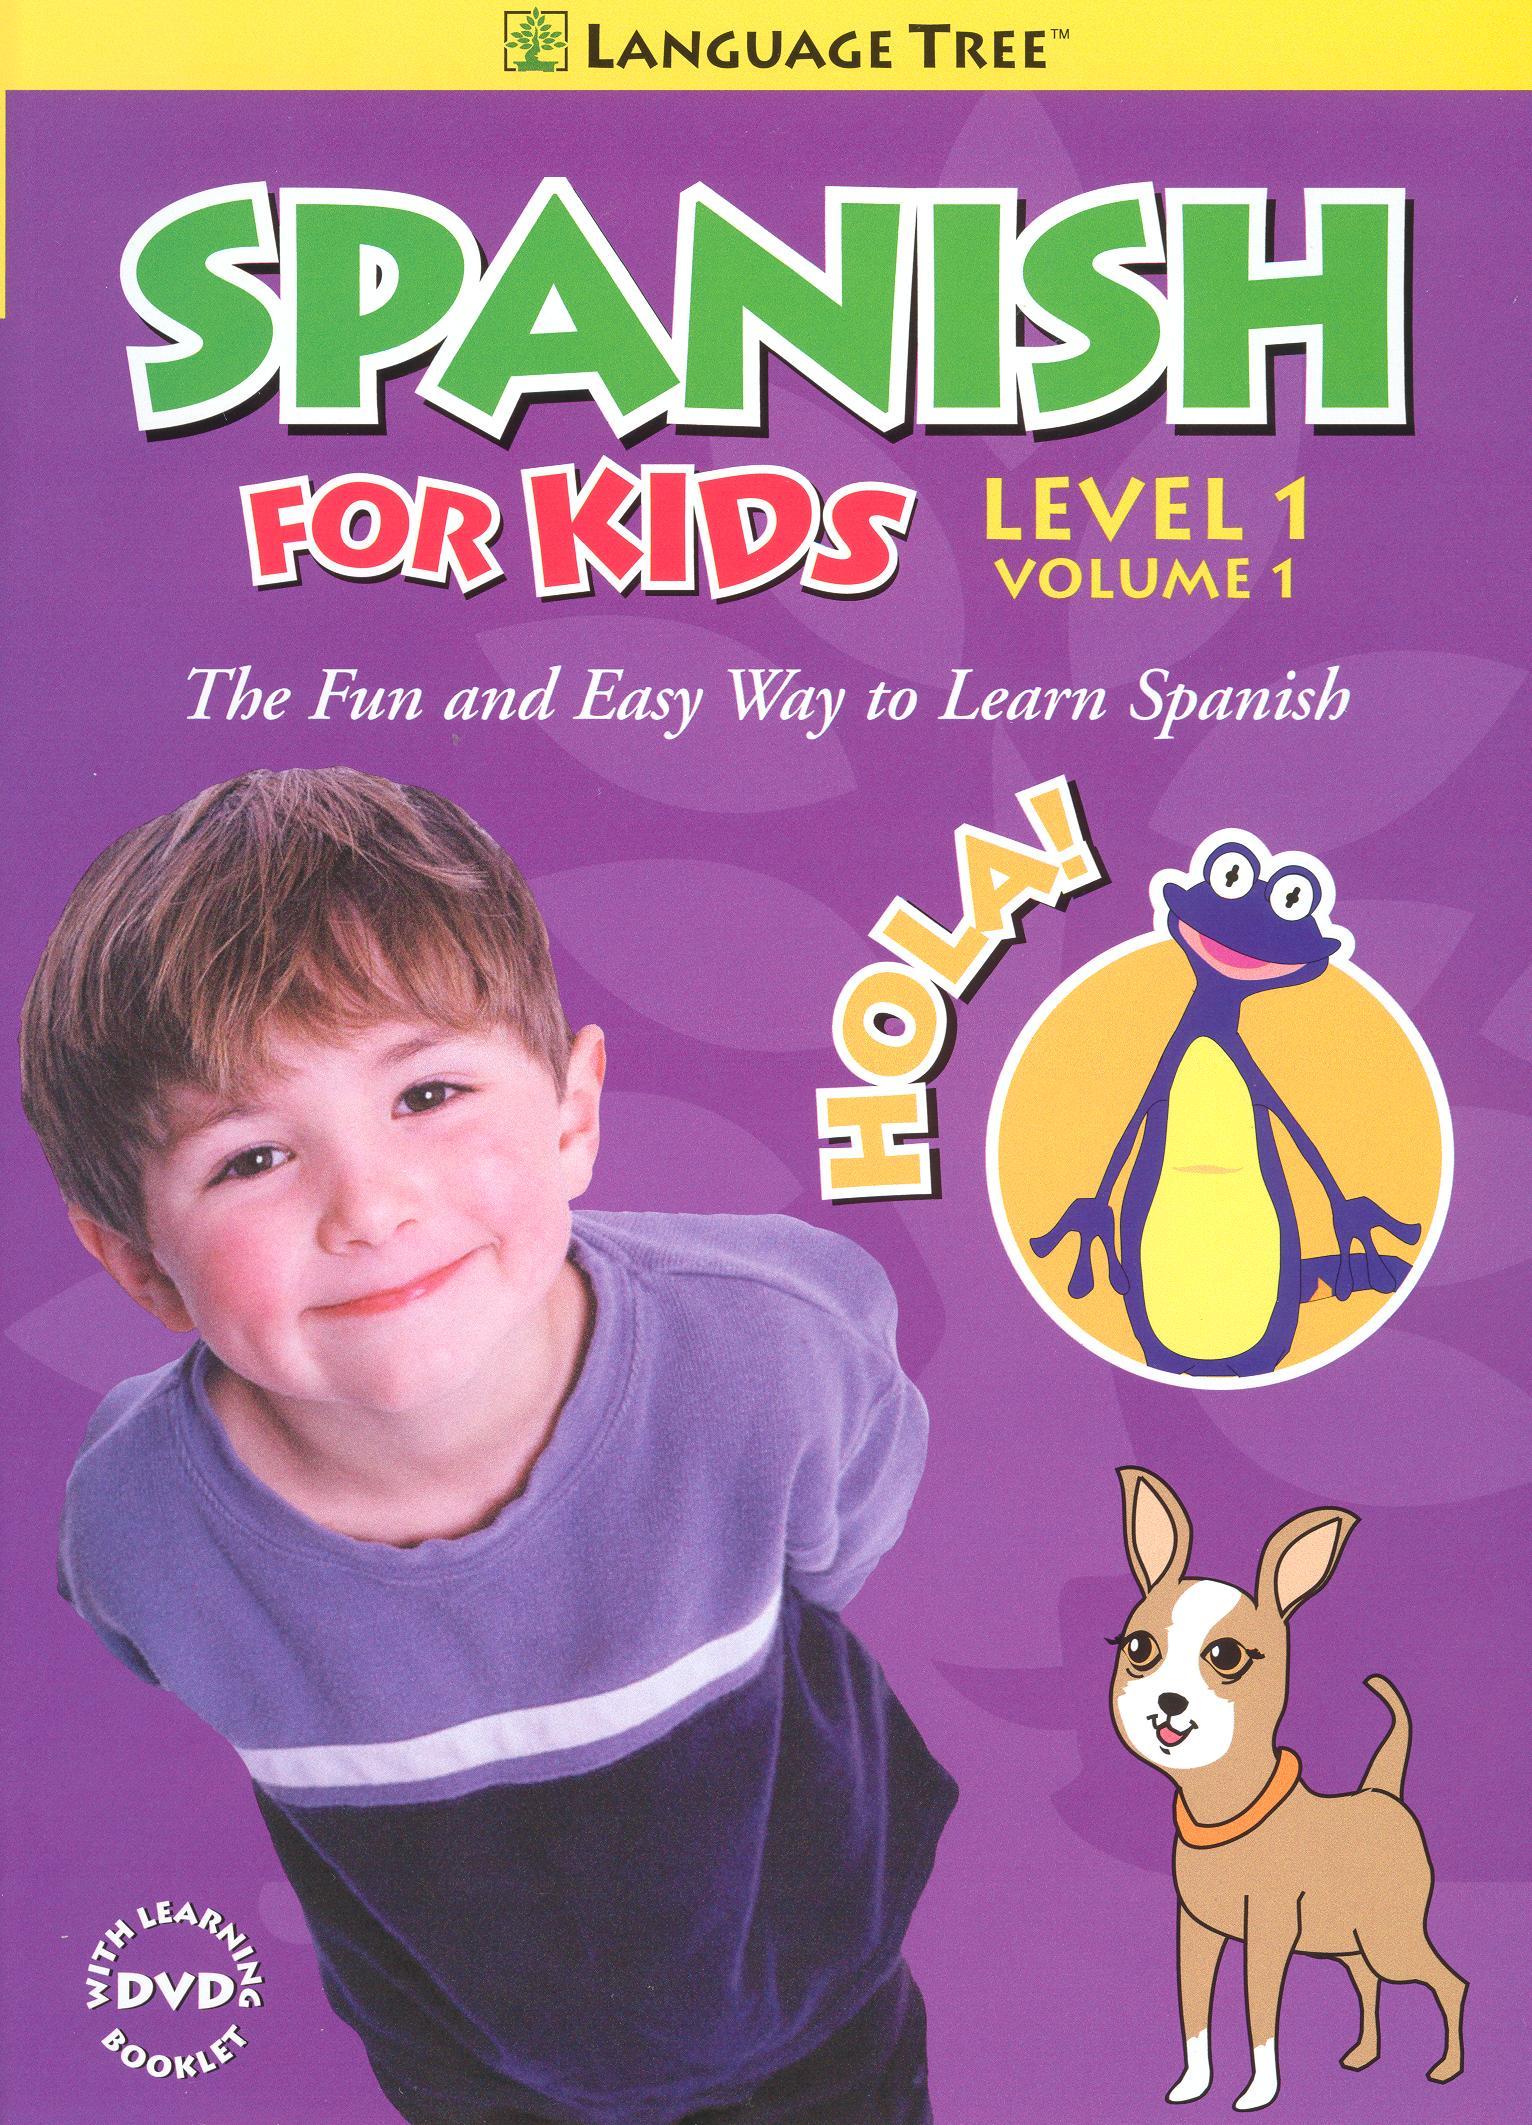 Spanish for Kids: Level 1, Vol. 1